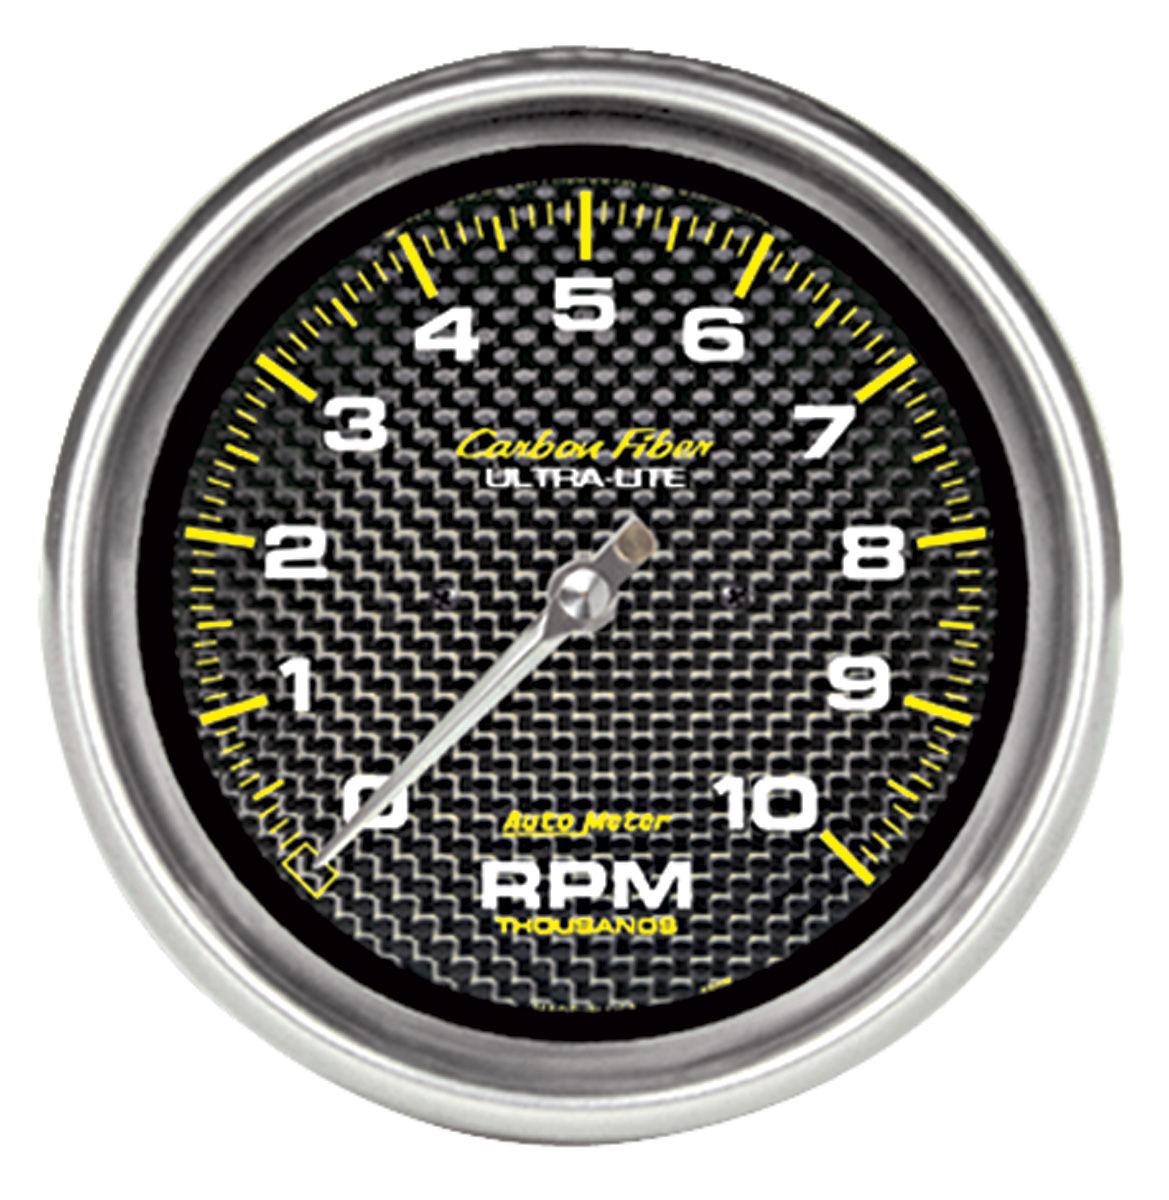 Gauge, Tachometer, Auto Meter, Carbon Fiber, 5